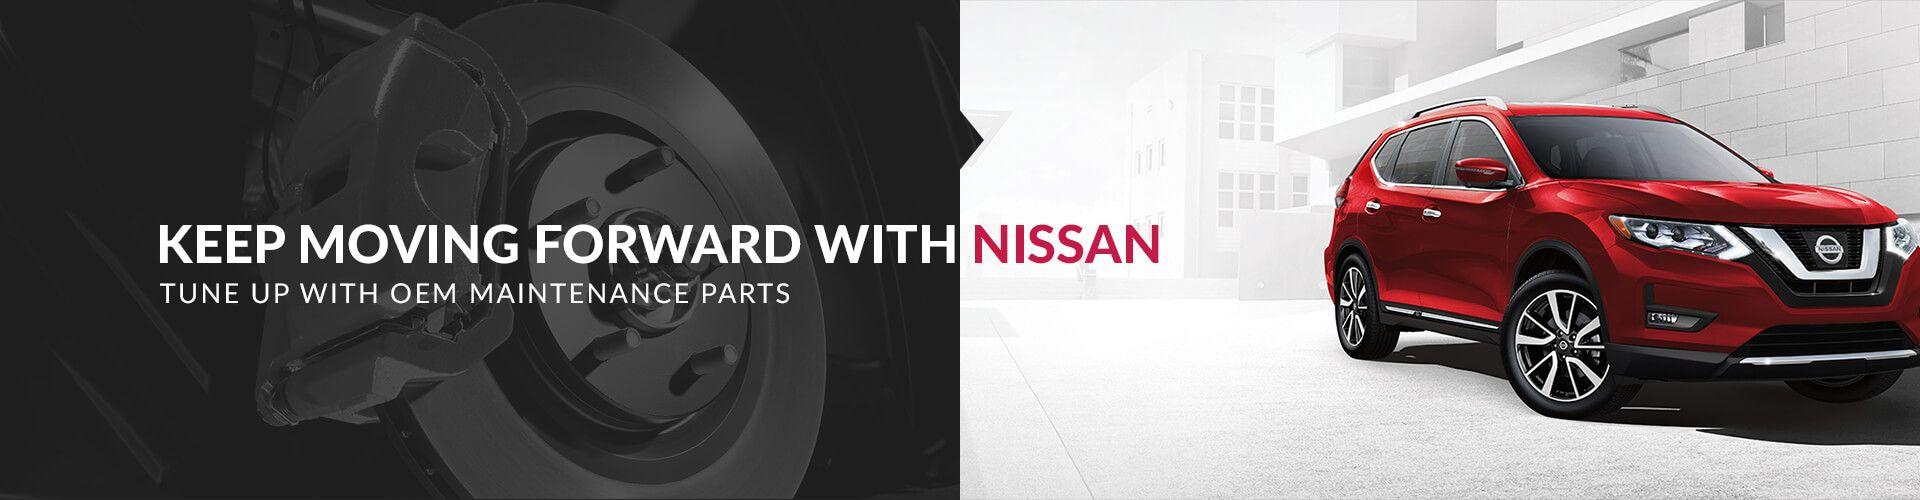 OEM Nissan Maintenance Parts